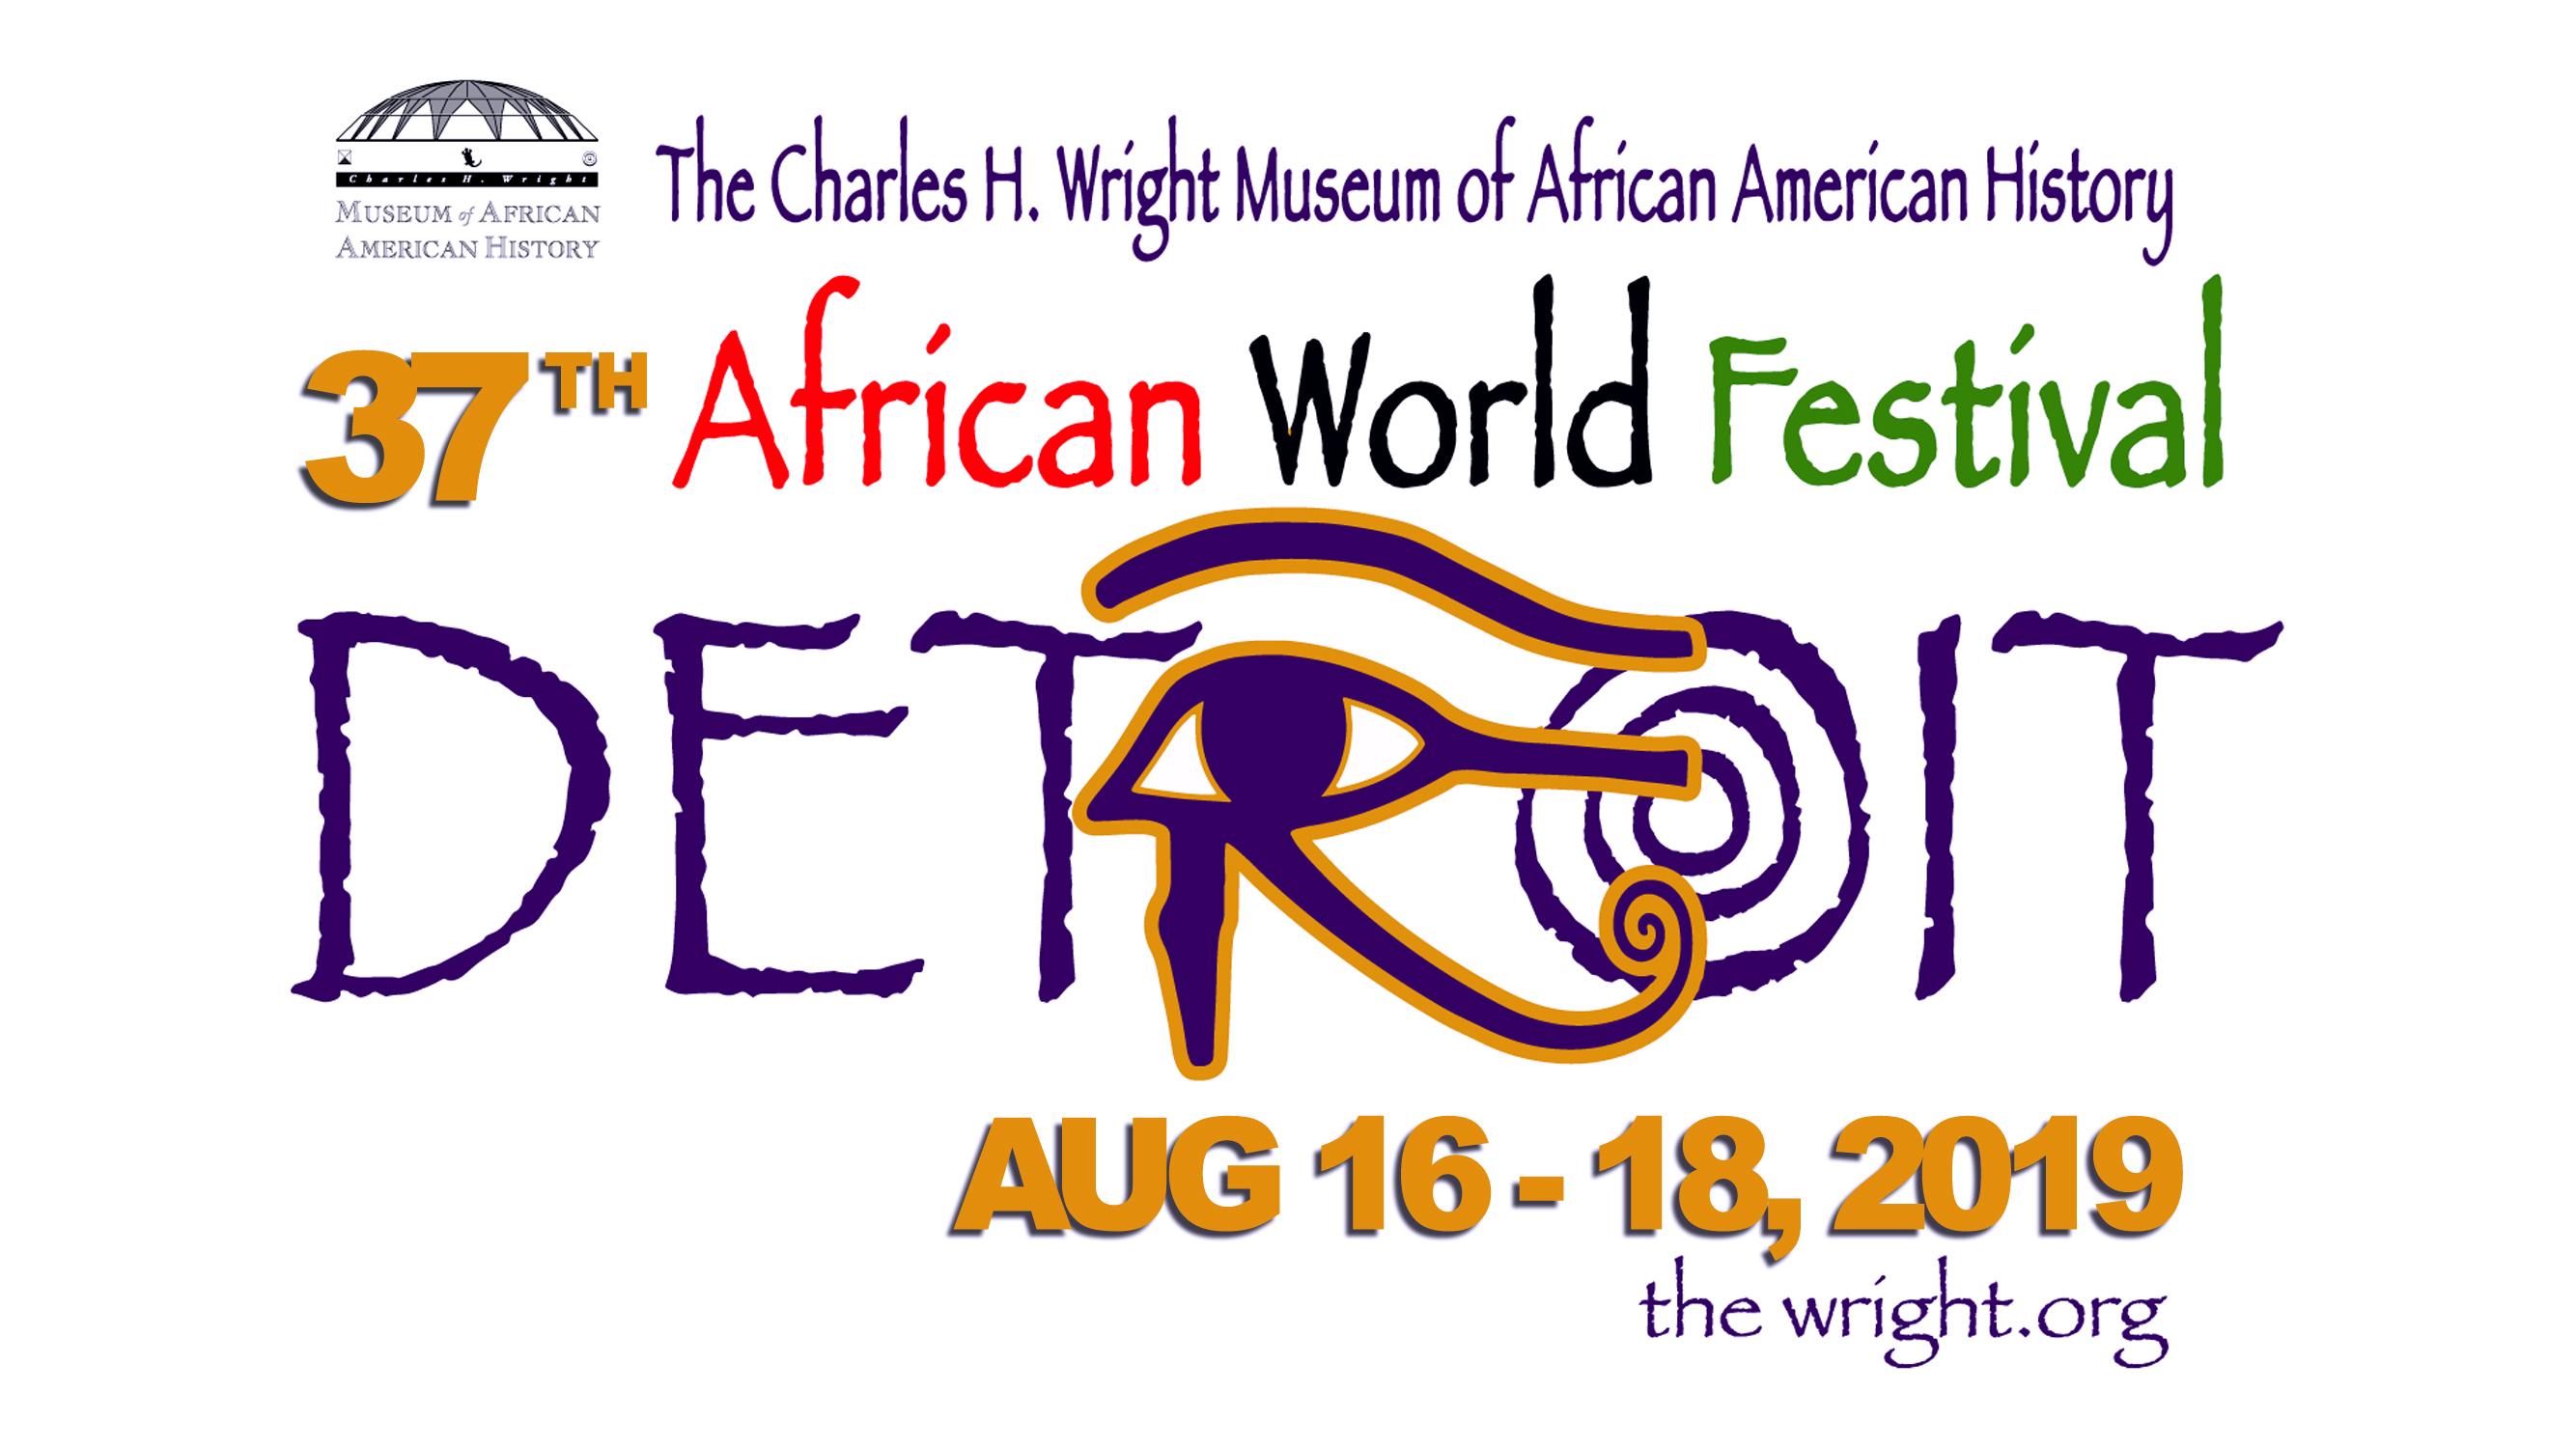 37th annual African World Festival